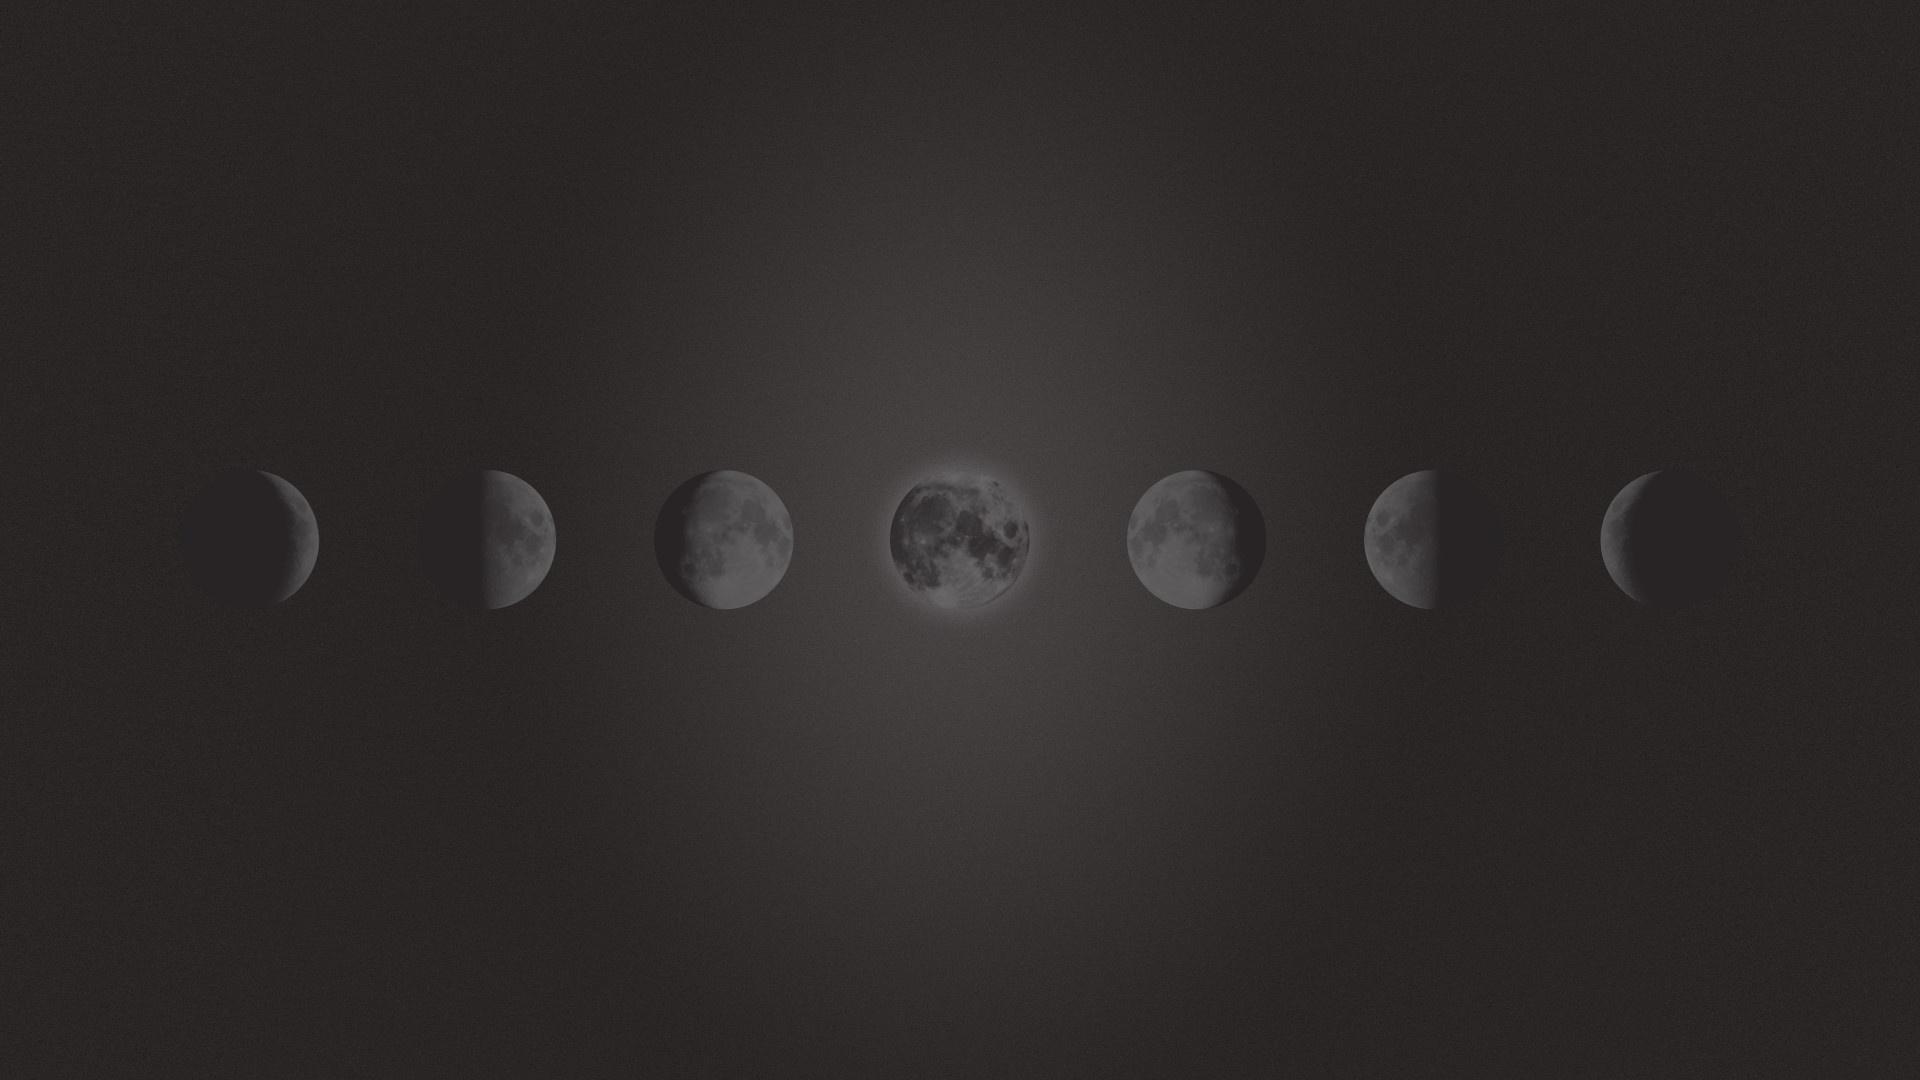 Moon Phases wallpaper photo hd